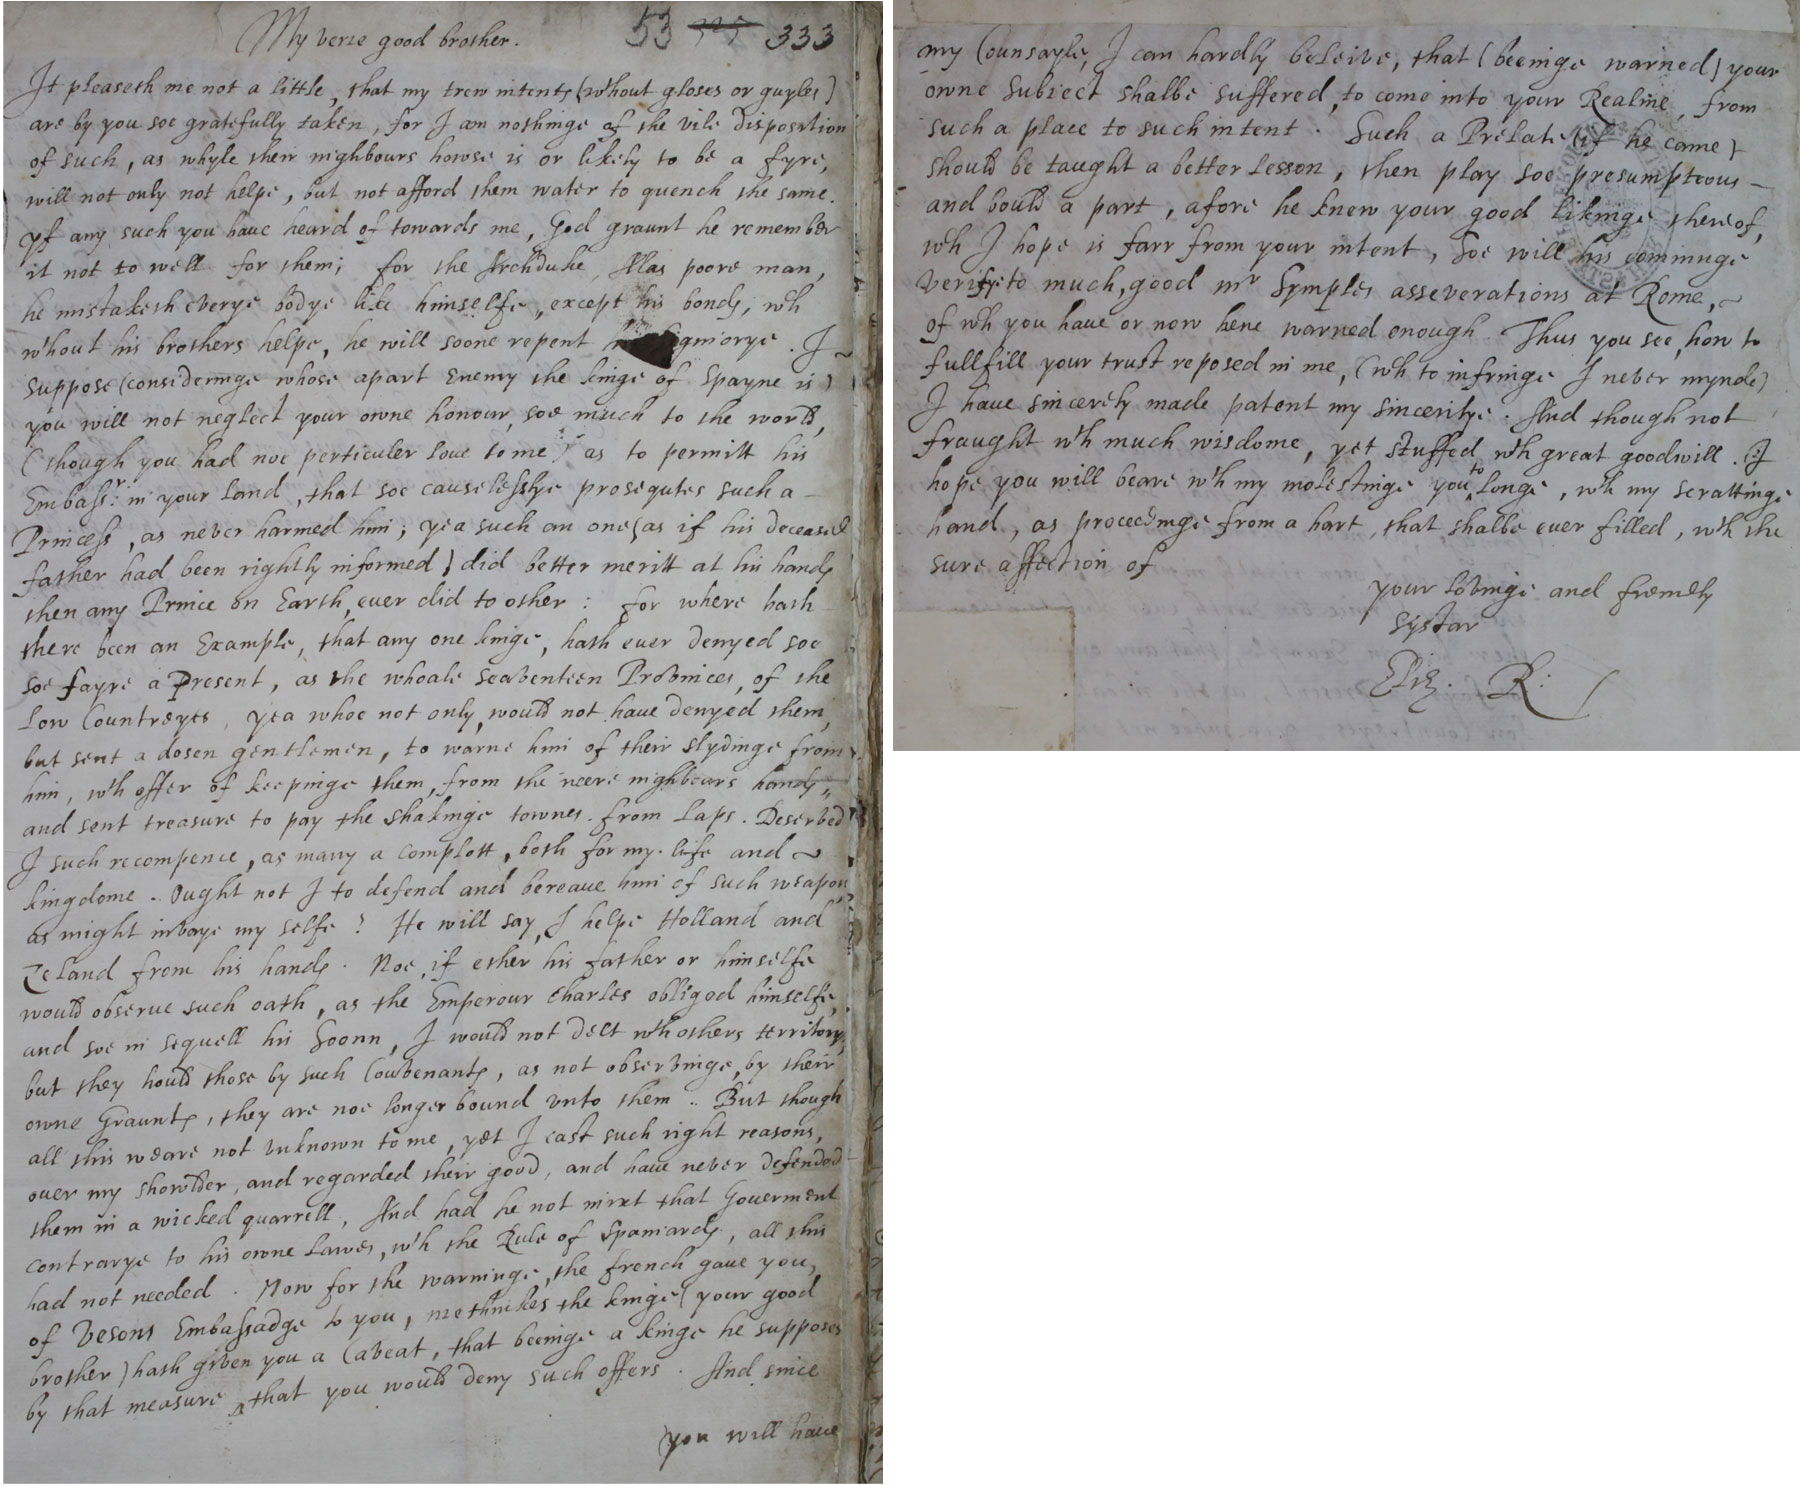 Elizabeth I to James VI, 5 January 1603 (SP 52/69 f.53)